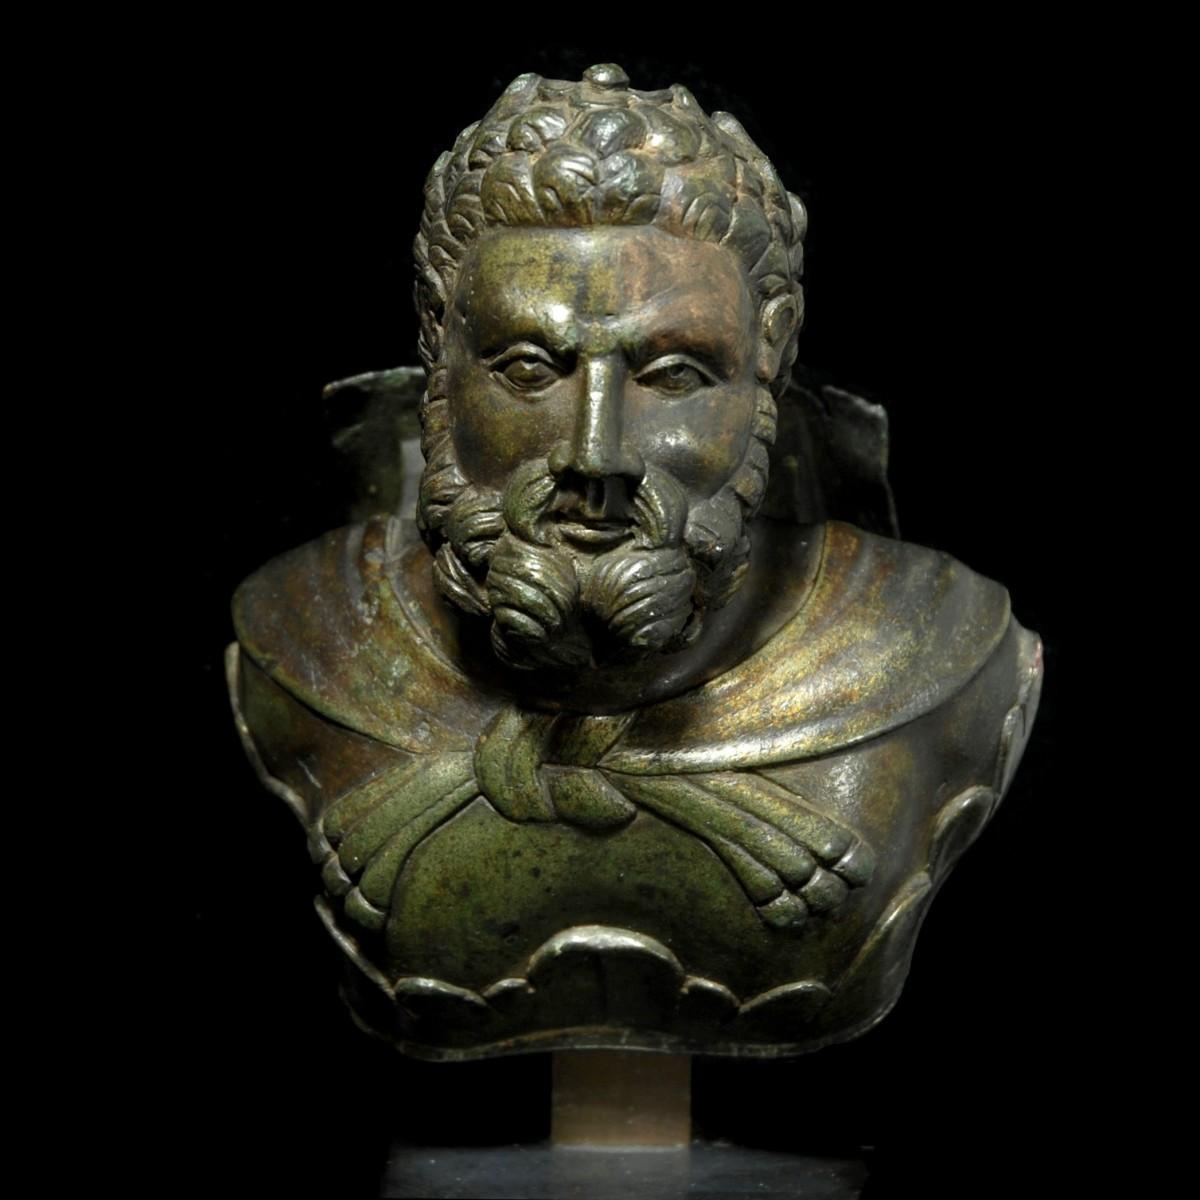 Roman Bronze bust of Hercules